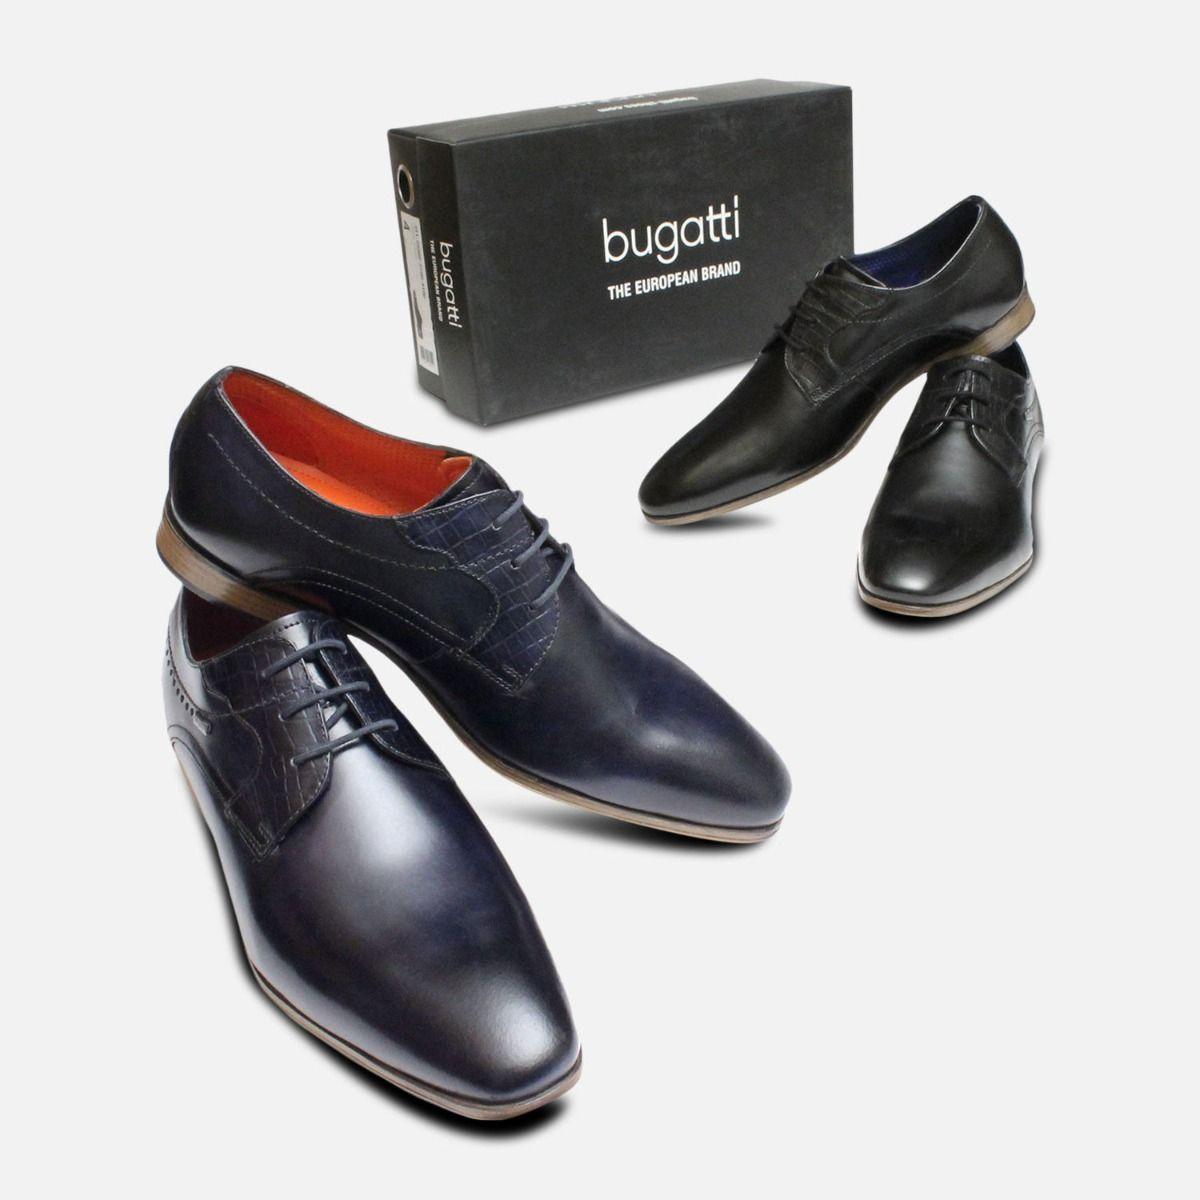 Formal Black Leather Dress Shoes by Bugatti